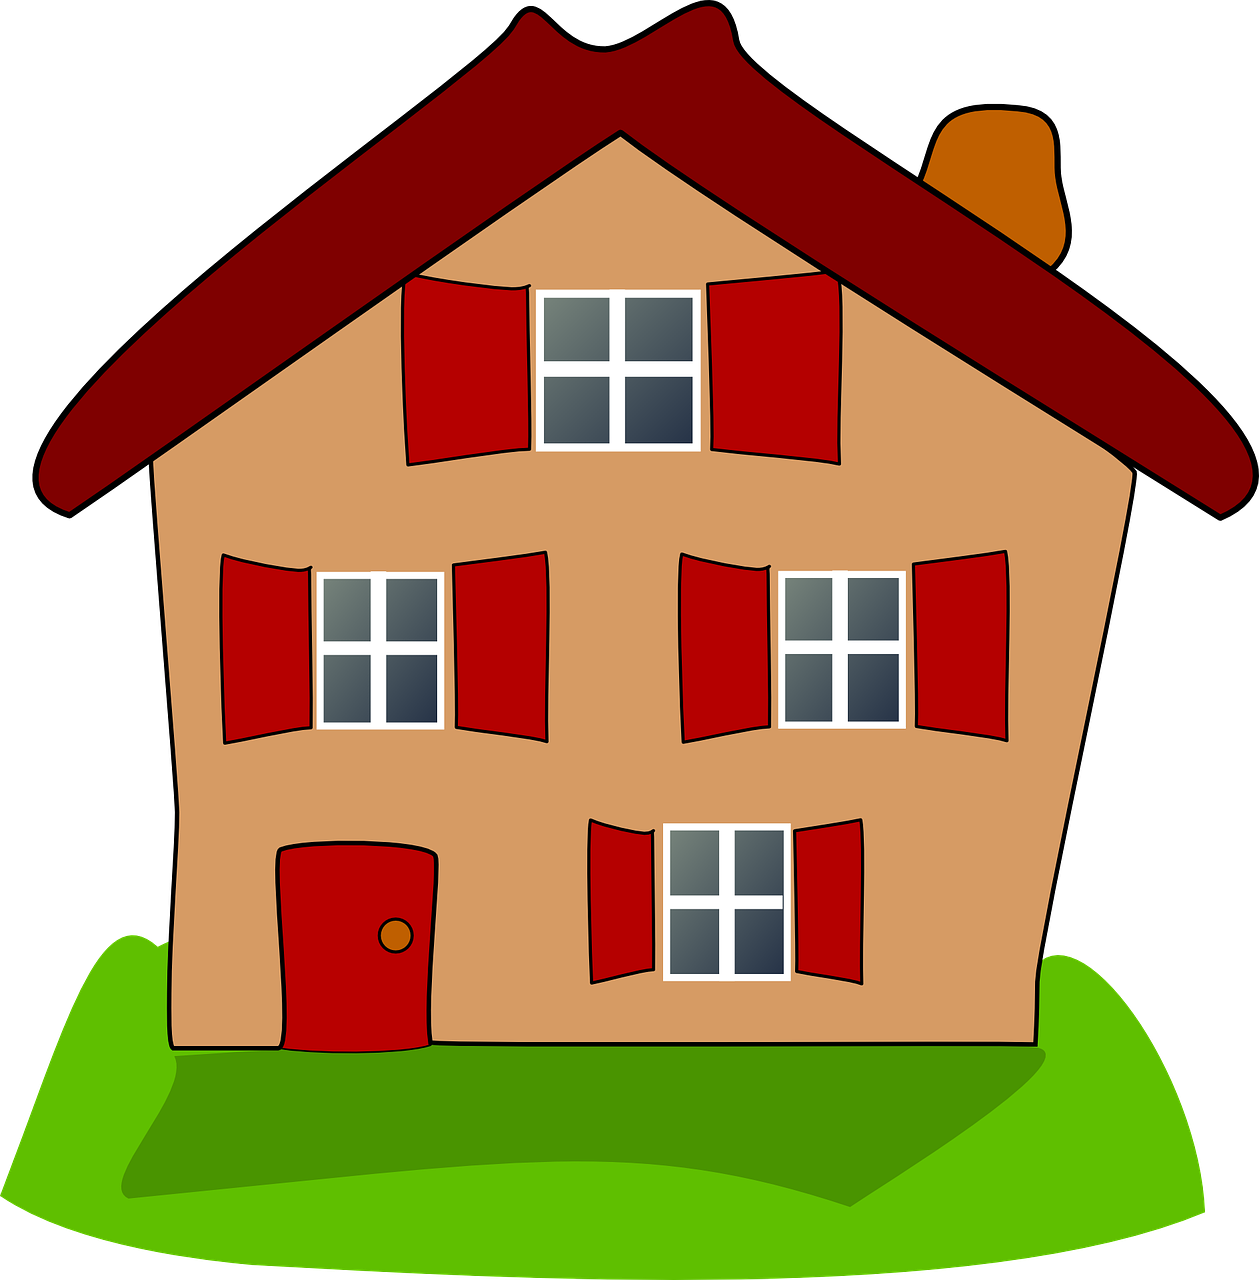 Картинки домика для детей с окошками, картинки про